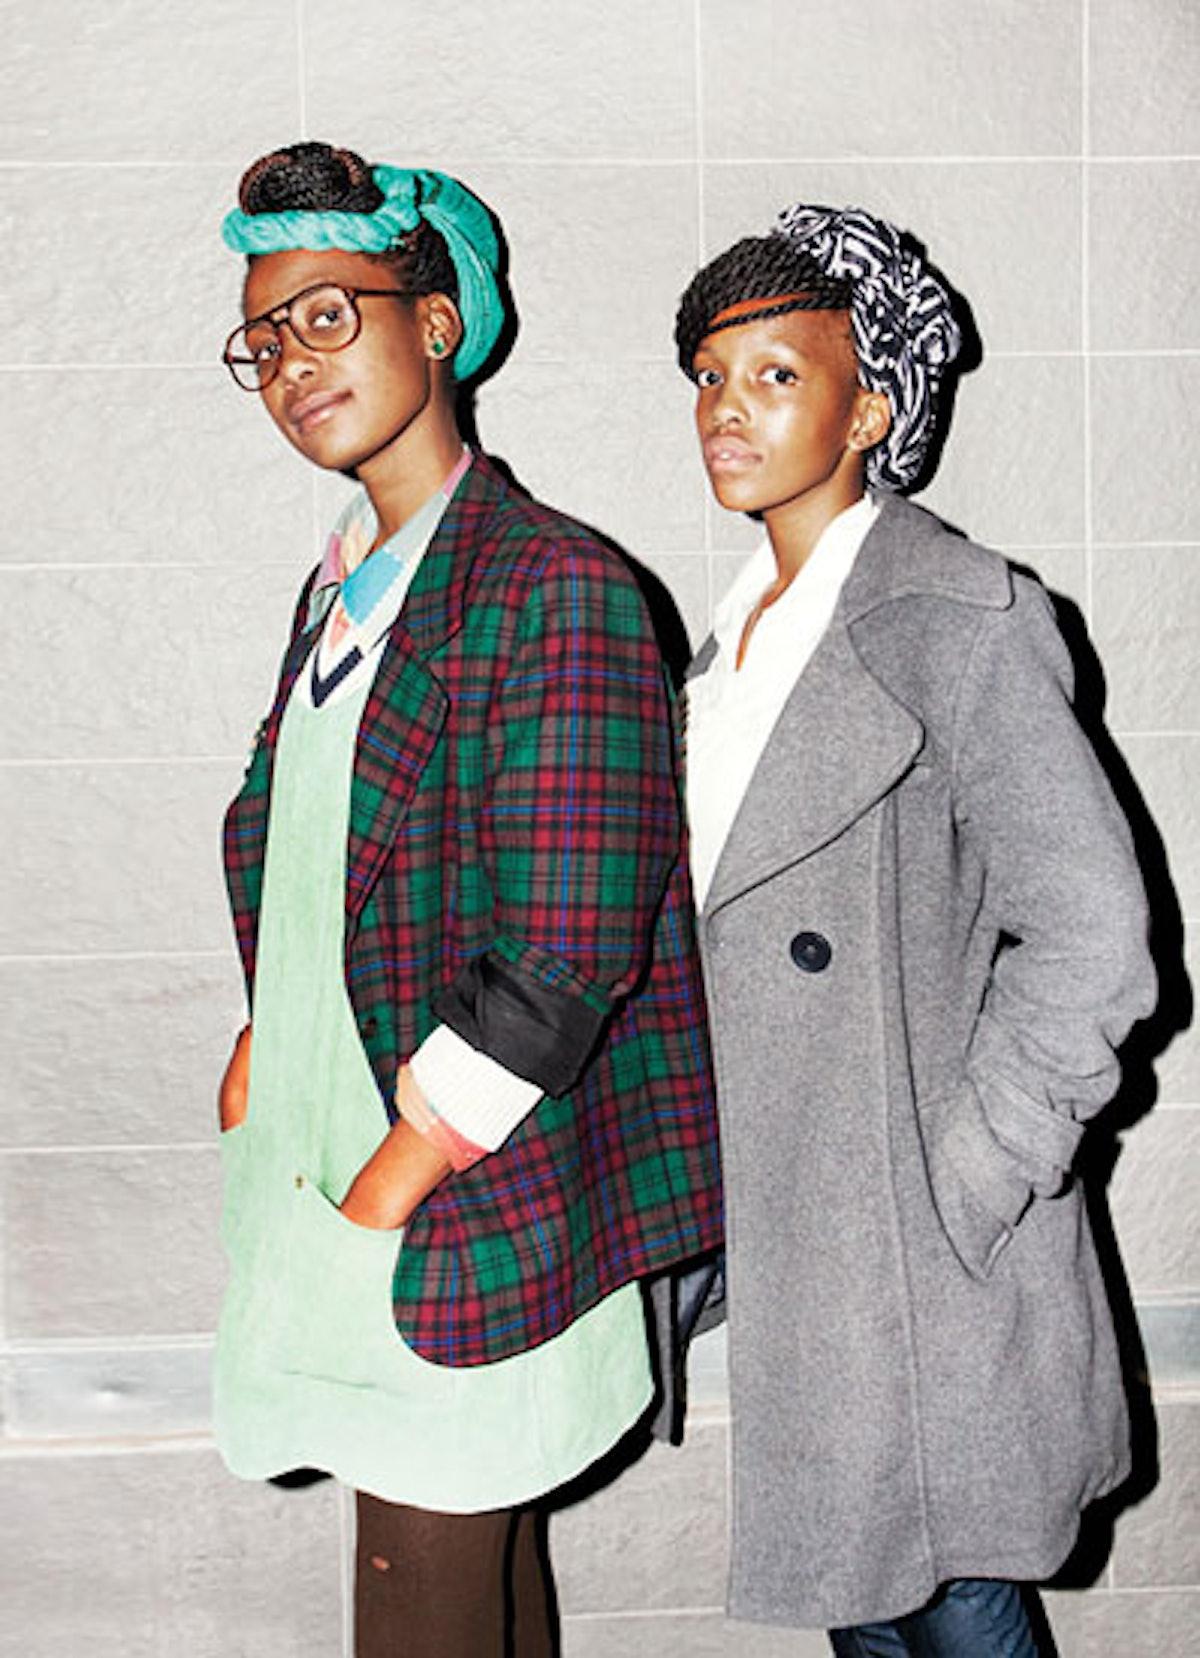 trss-south-african-fashion-scene-07-v.jpg